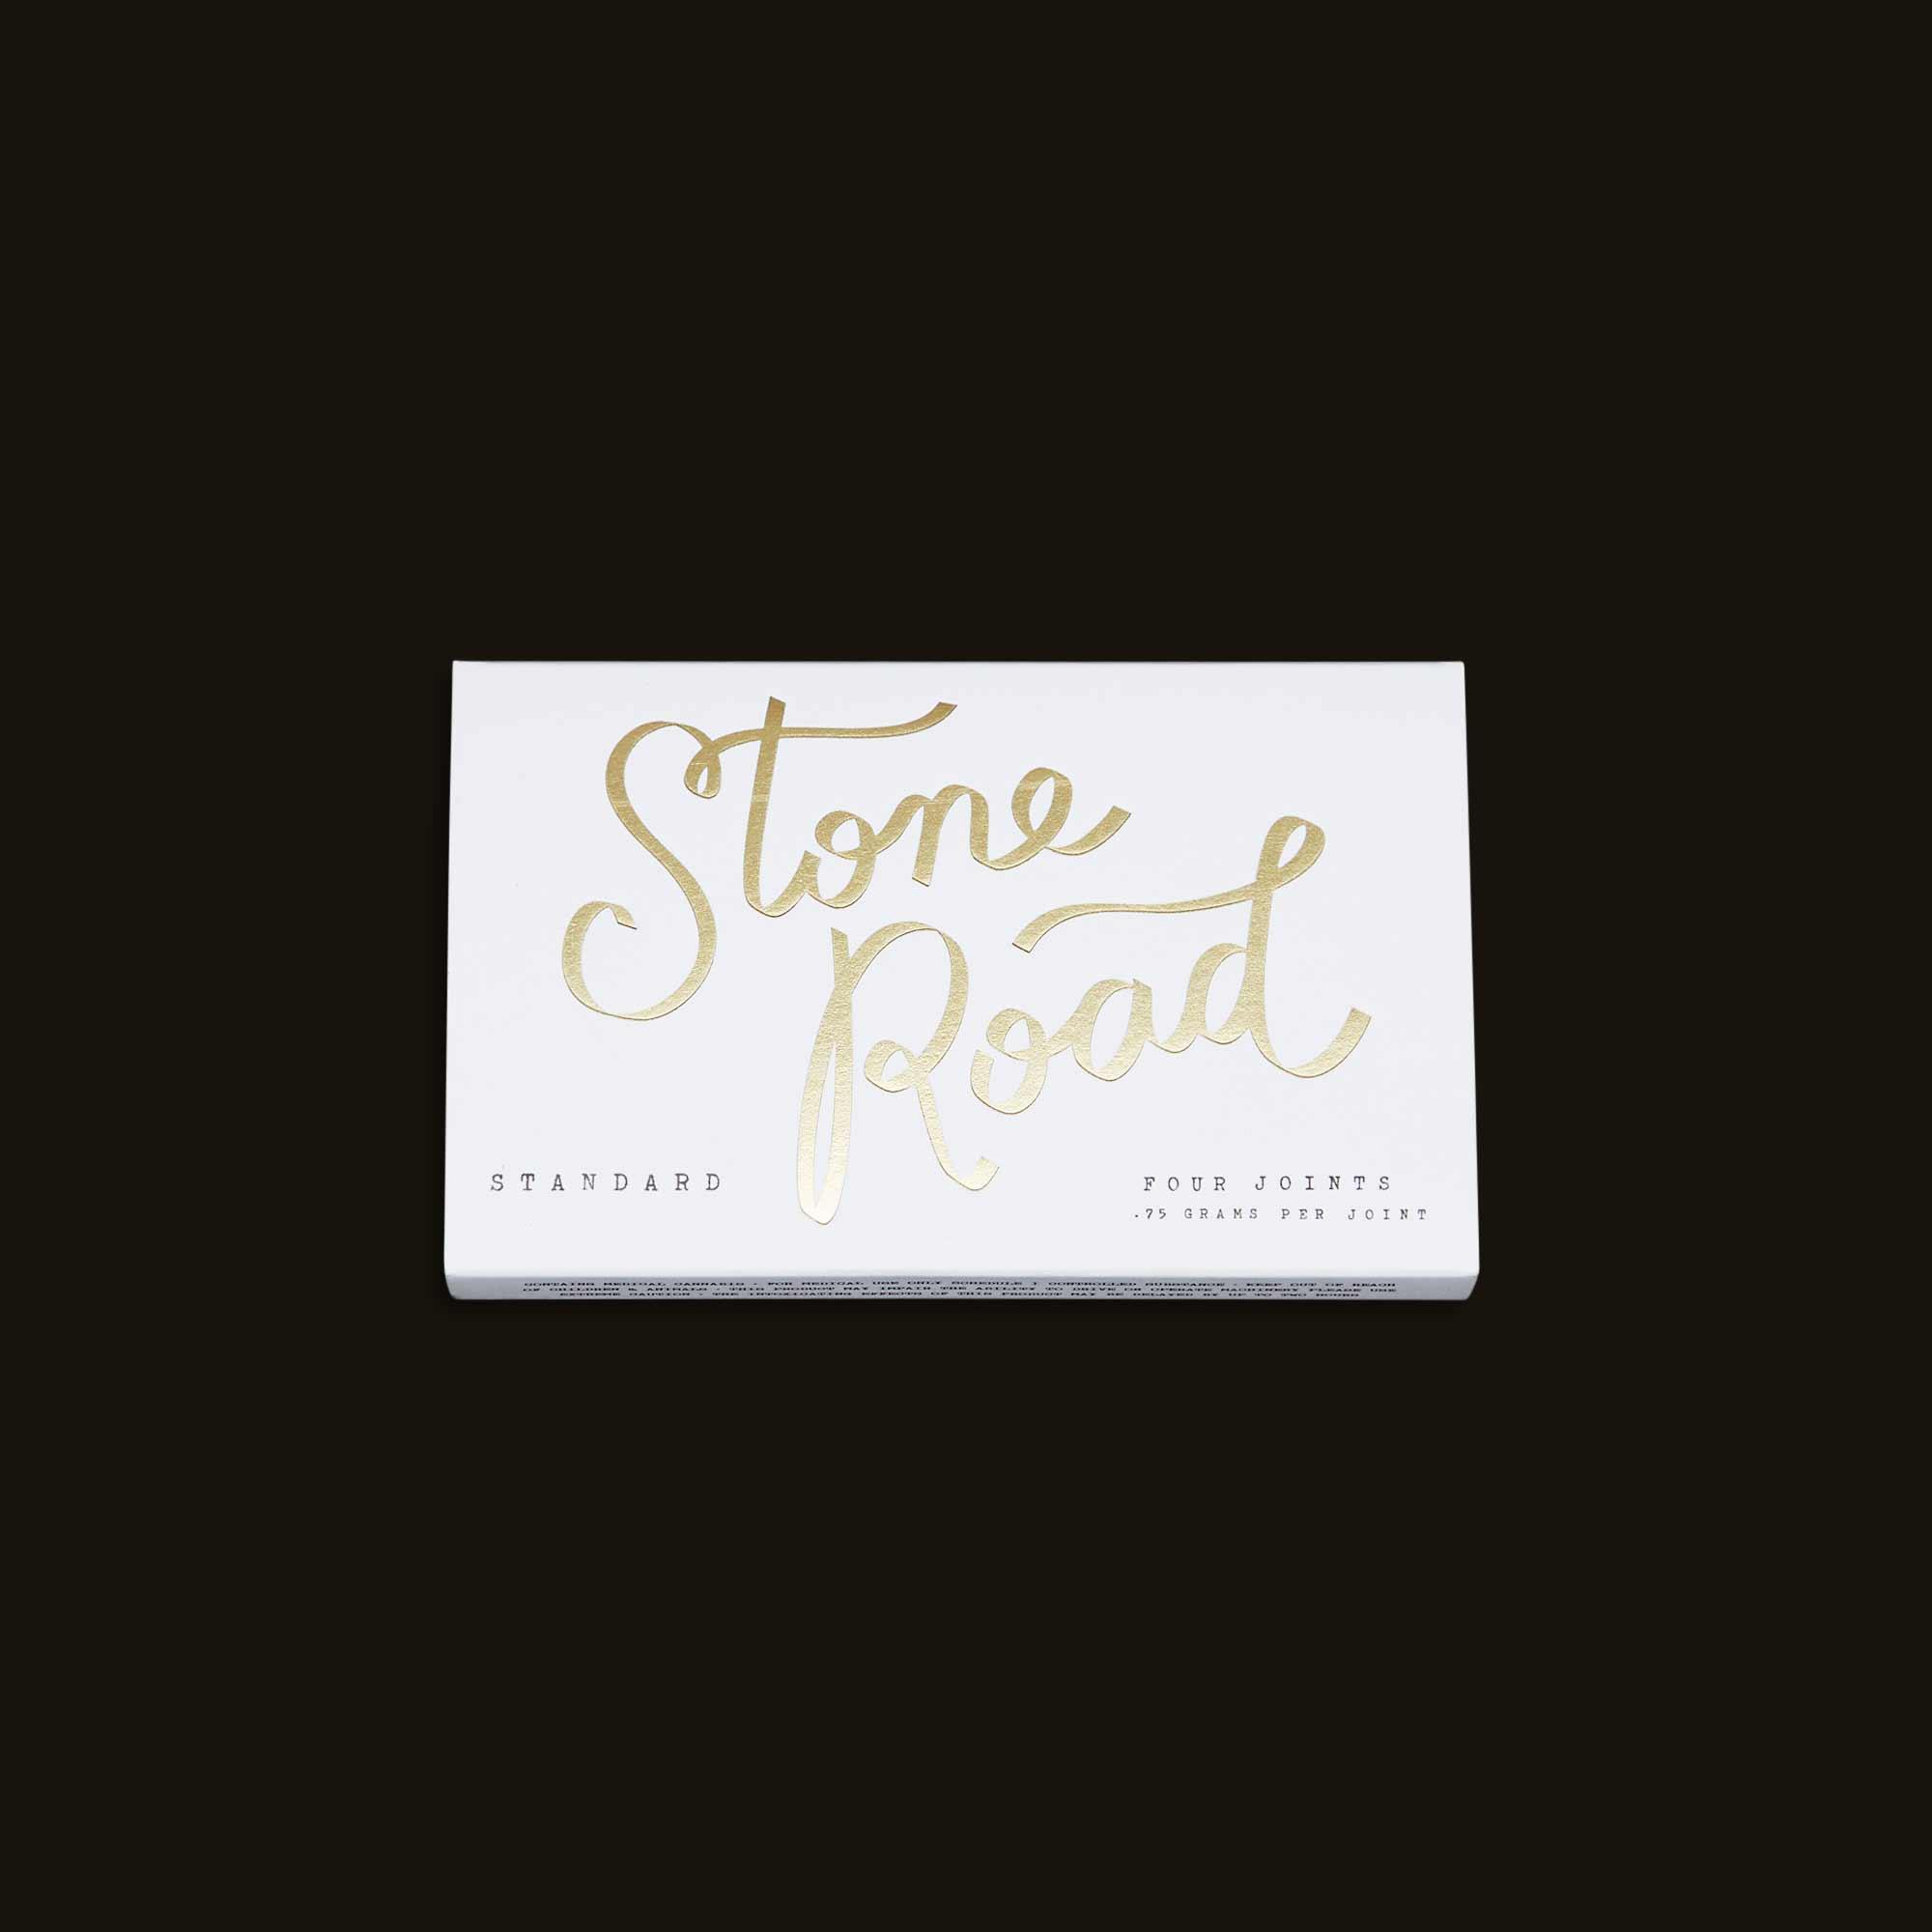 Stone Road Pre-Rolls - Stone Road Standard